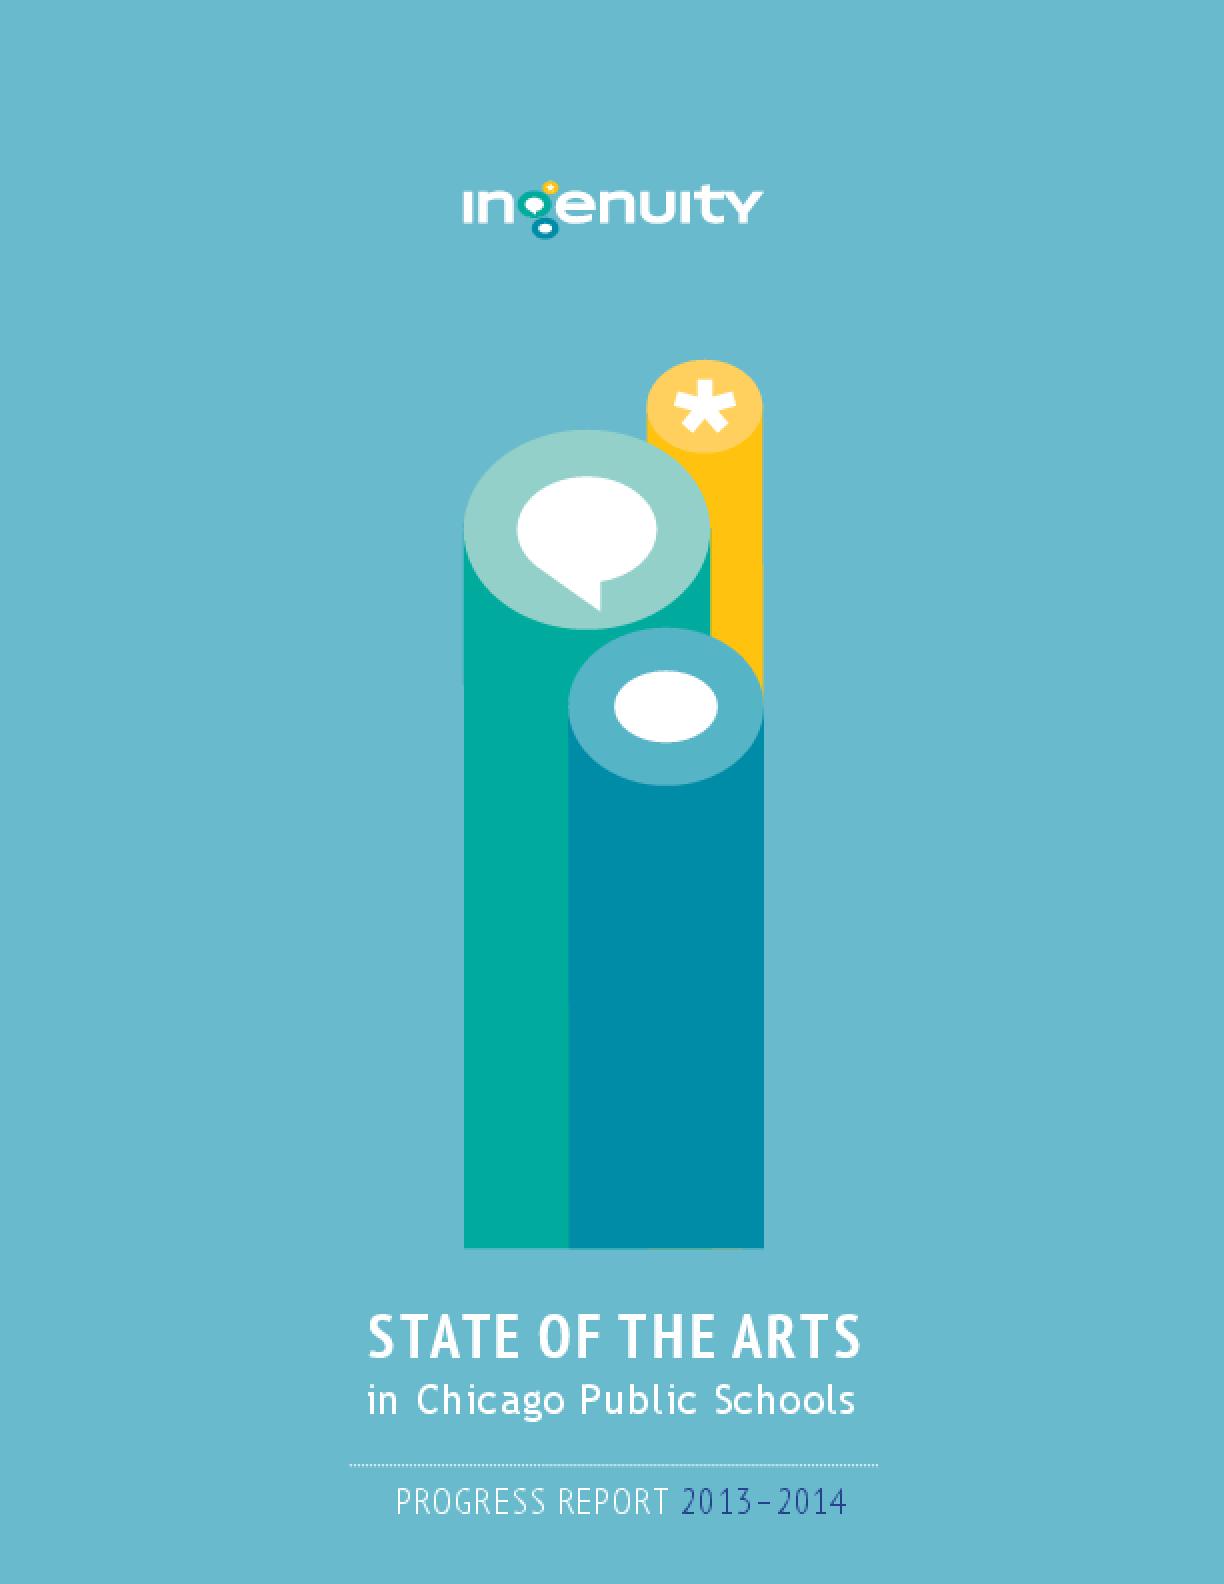 State of the Arts in Chicago Public Schools Progress Report 2013-14